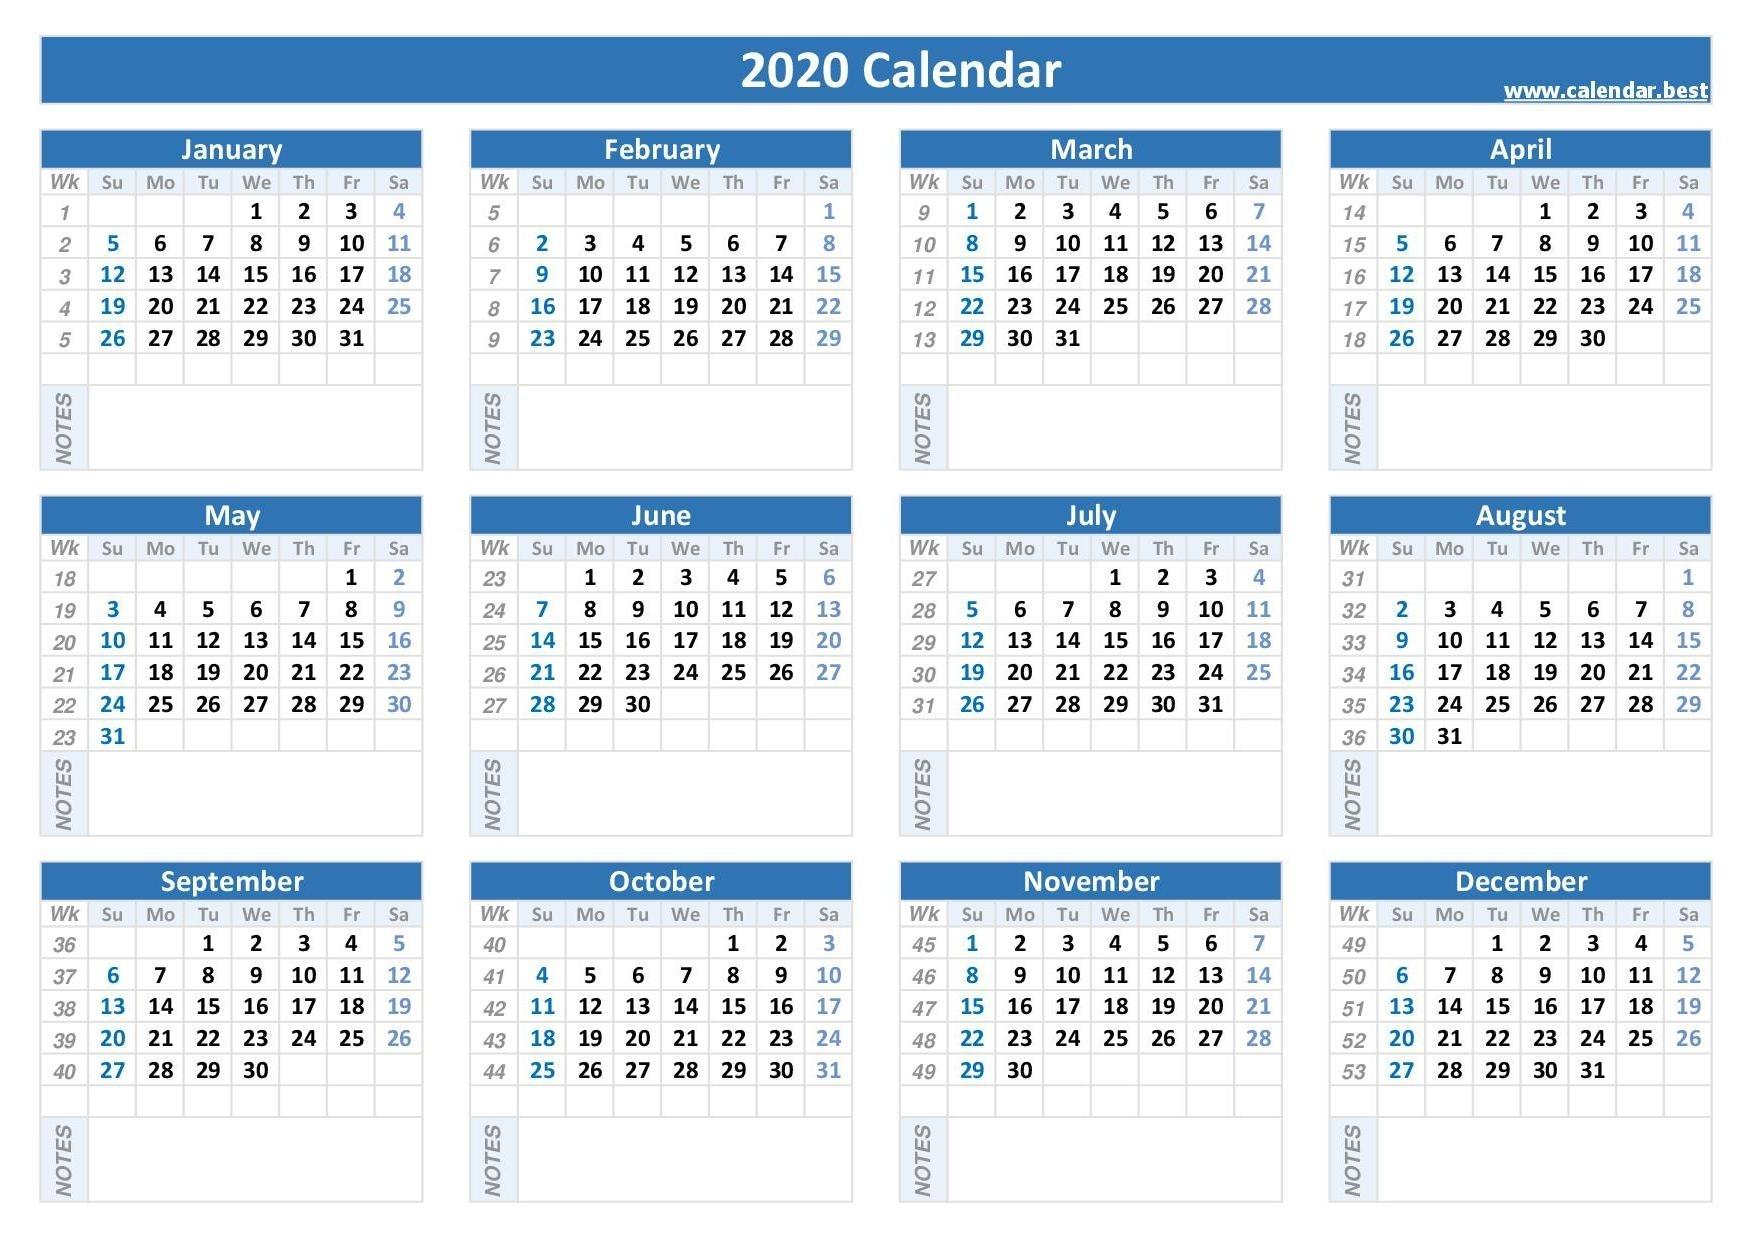 2020 Calendar With Week Numbers -Calendar.best intended for Calendar For 2020 Week Wise